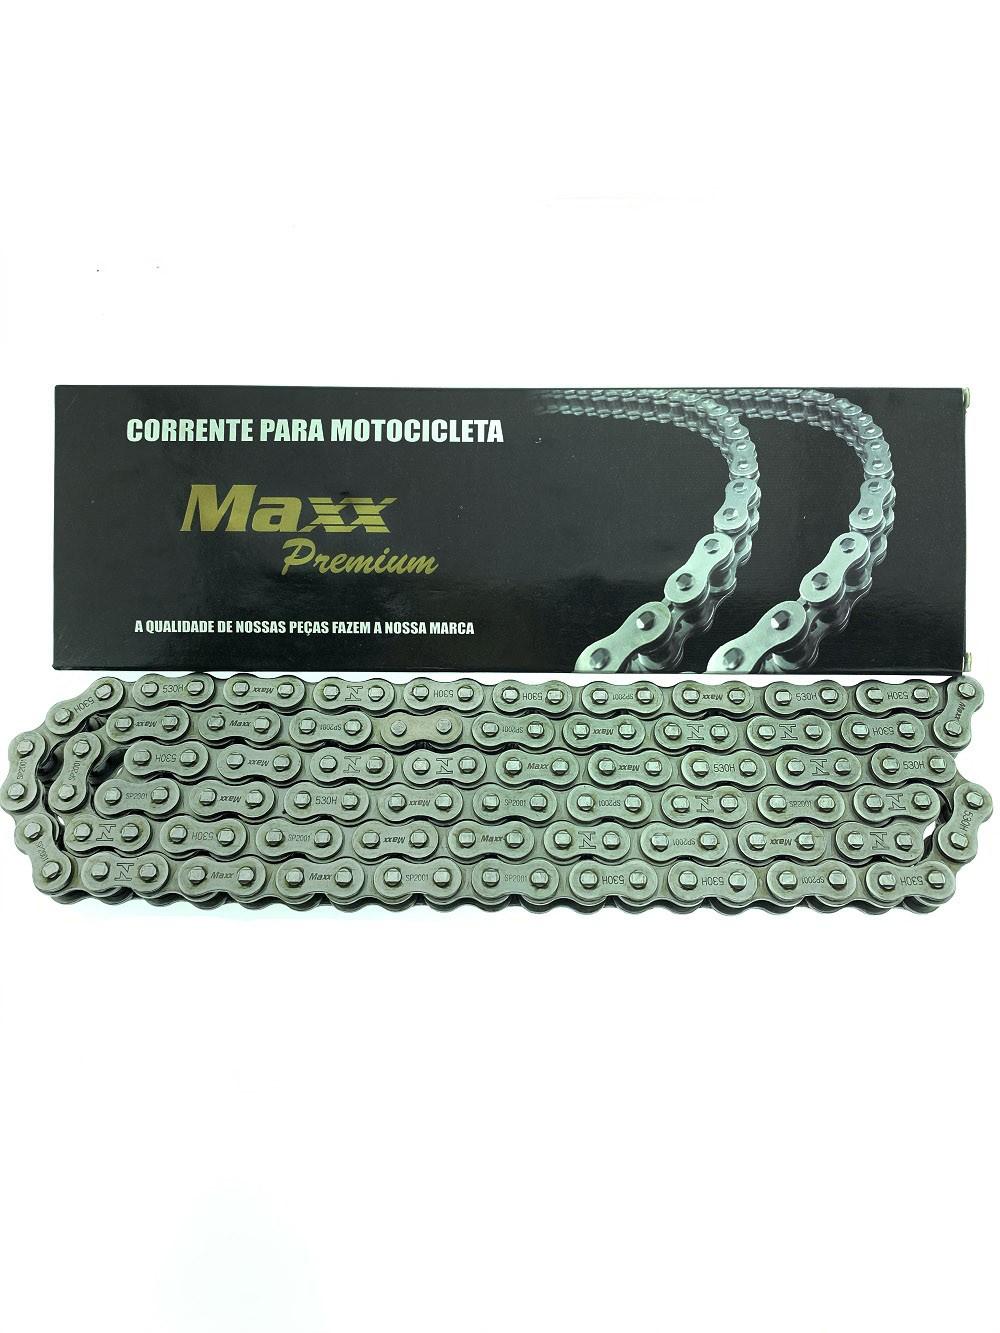 Corrente Transmissão Maxx Premium 530H x 120L